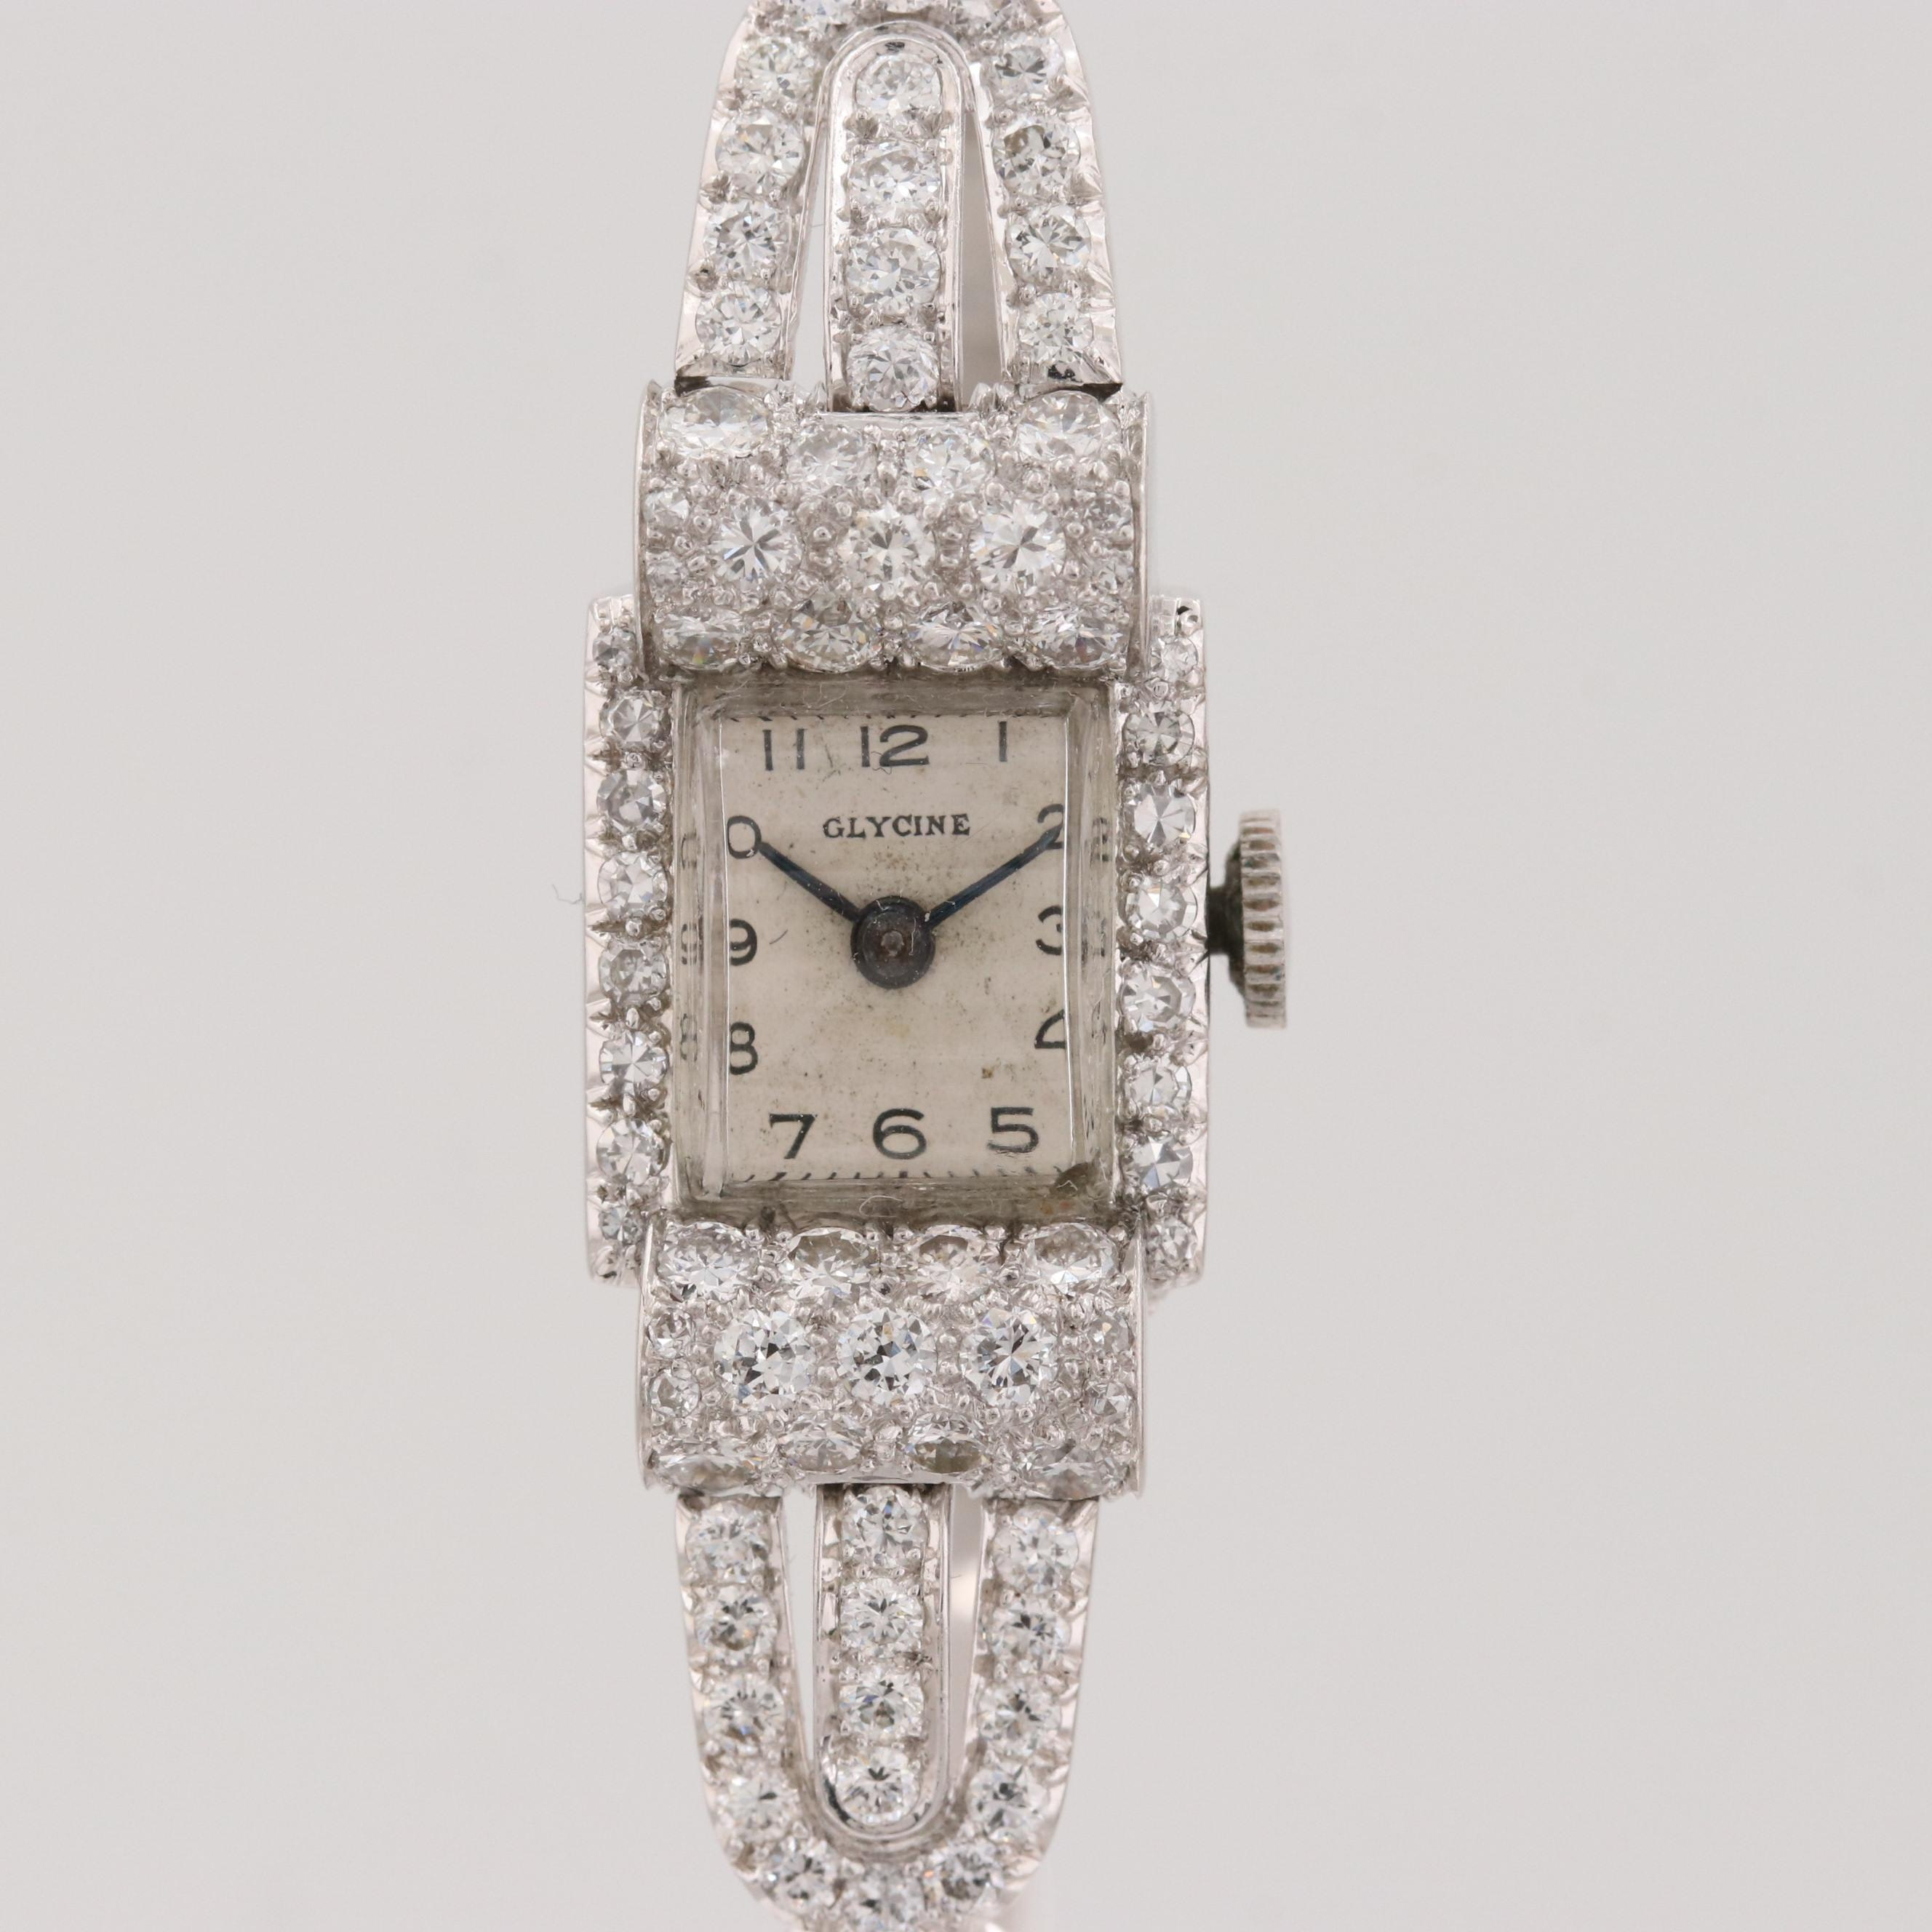 Glycine 2.54 CTW Diamond,14K White Gold and Platinum Wristwatch